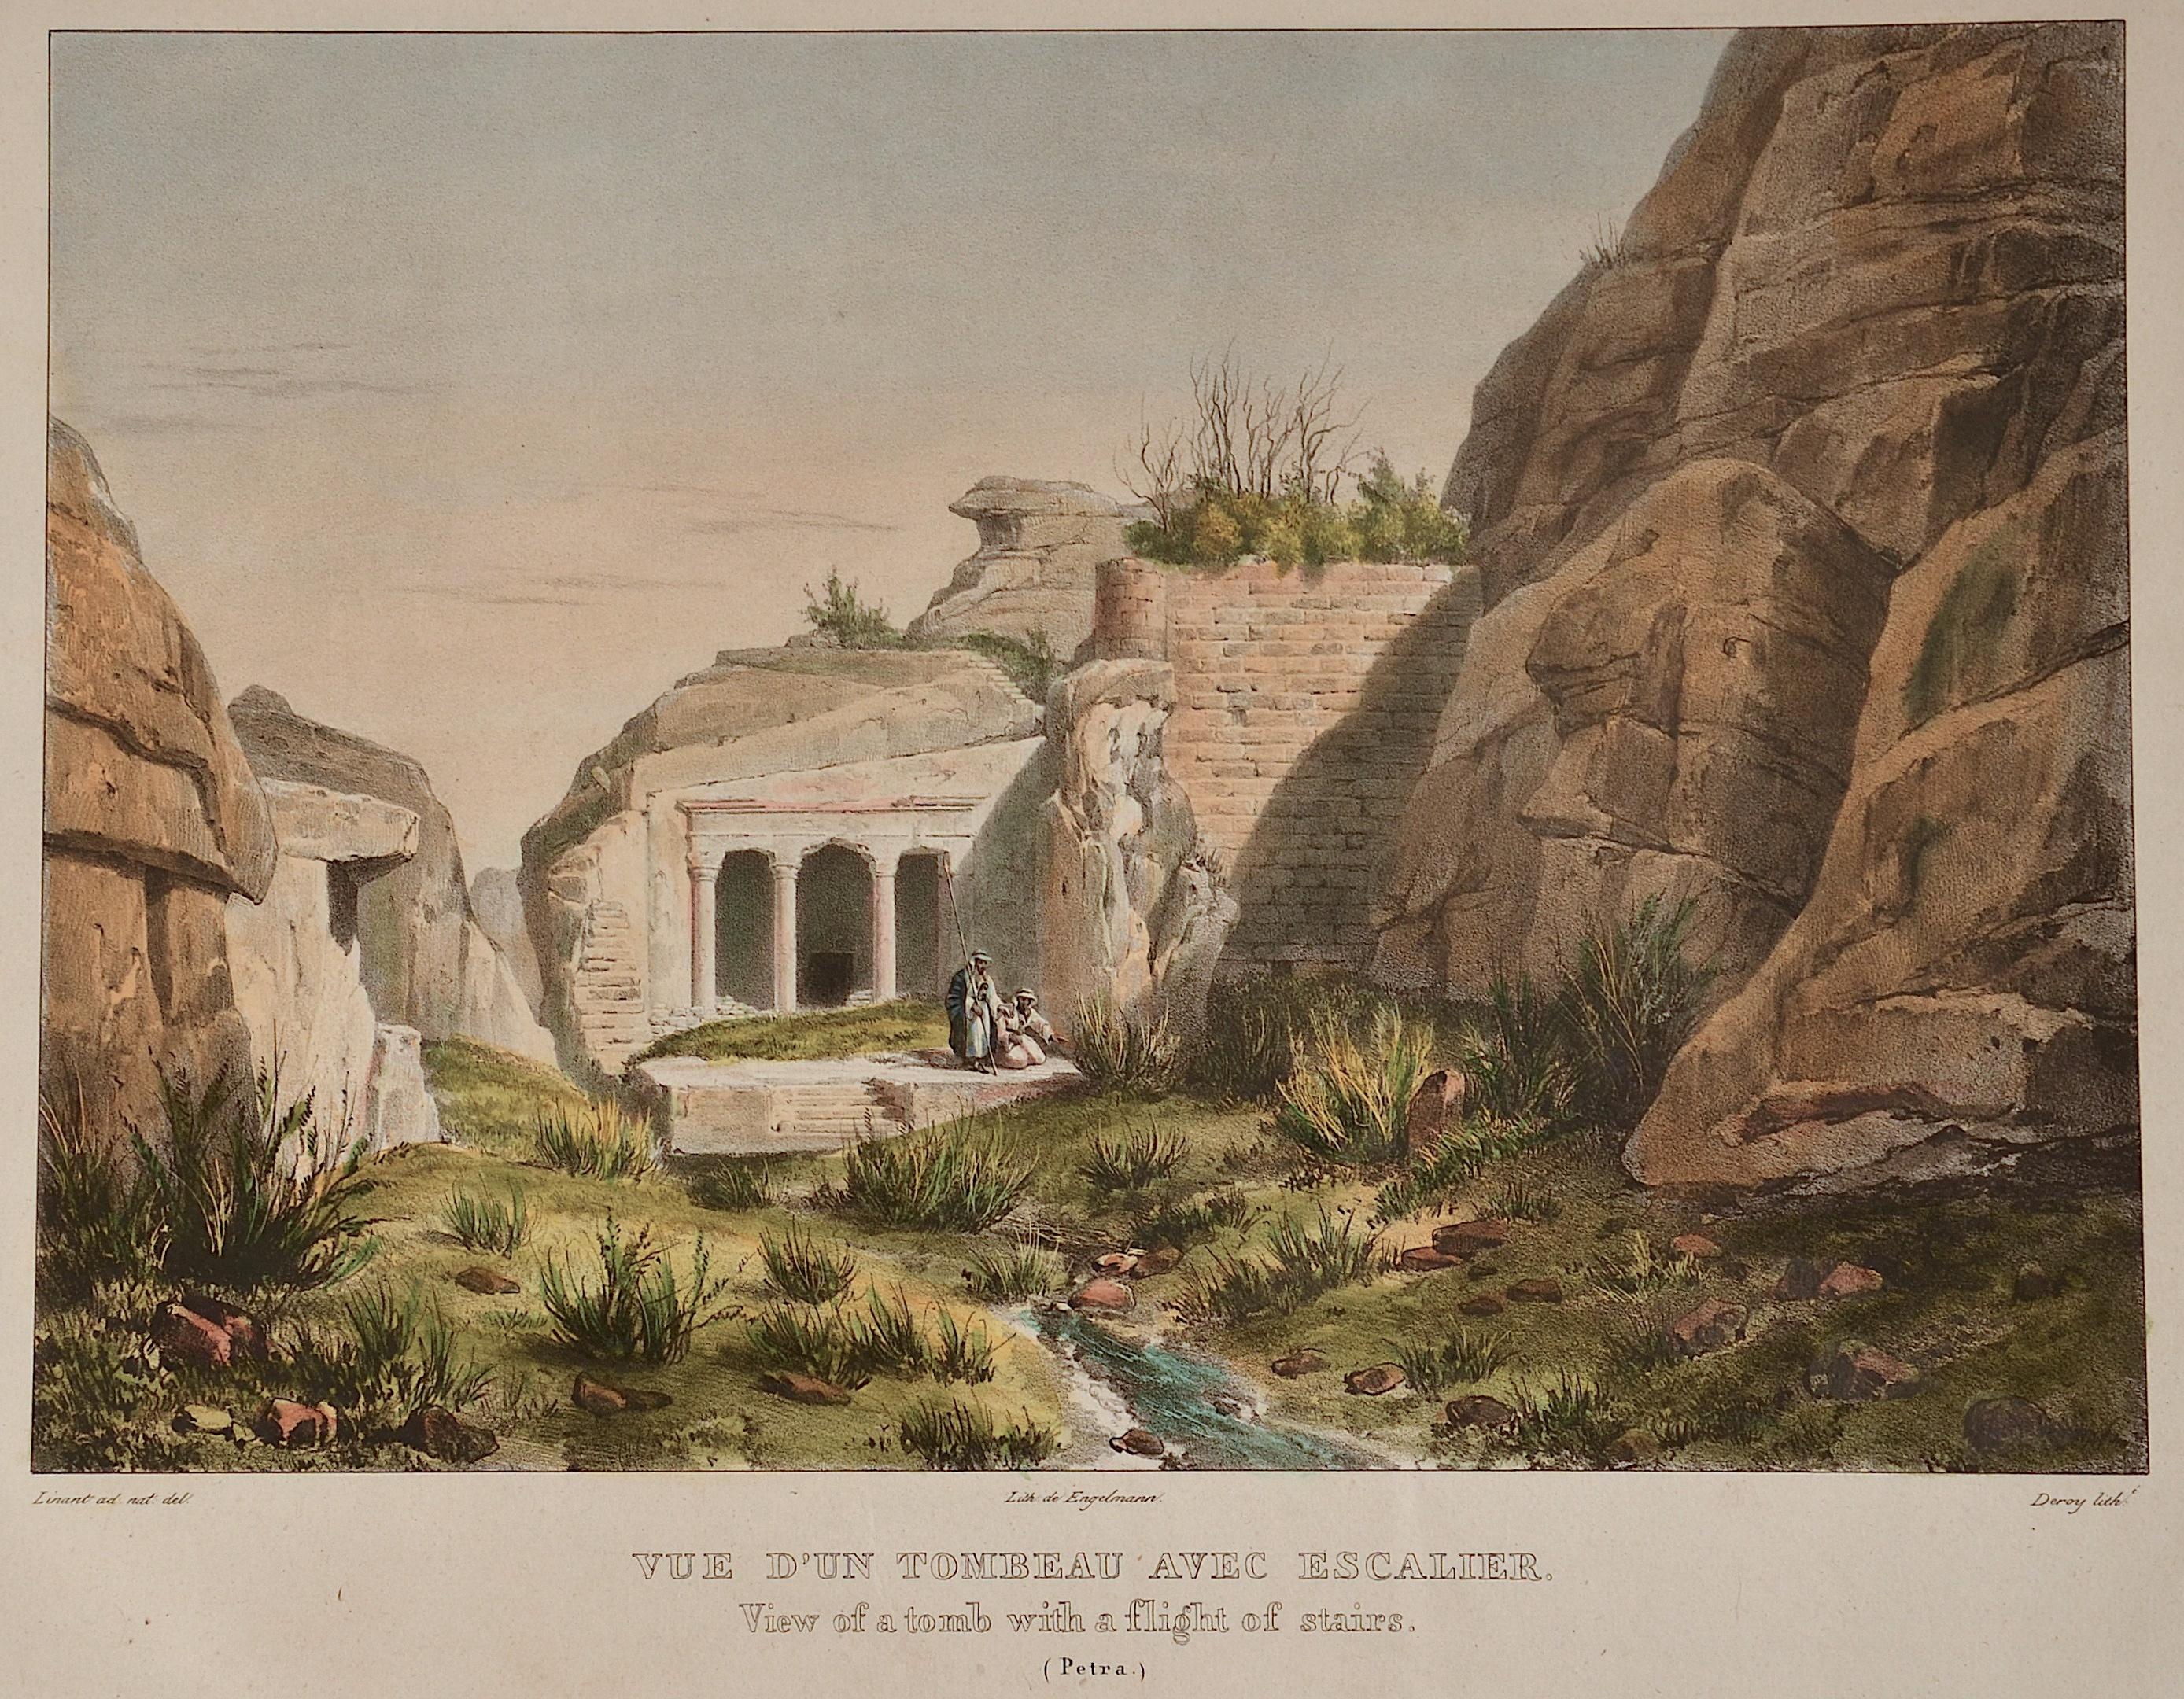 Engelmann  Vue d´un tobeau avec escalier/ view of a tomb with a flight of stairs